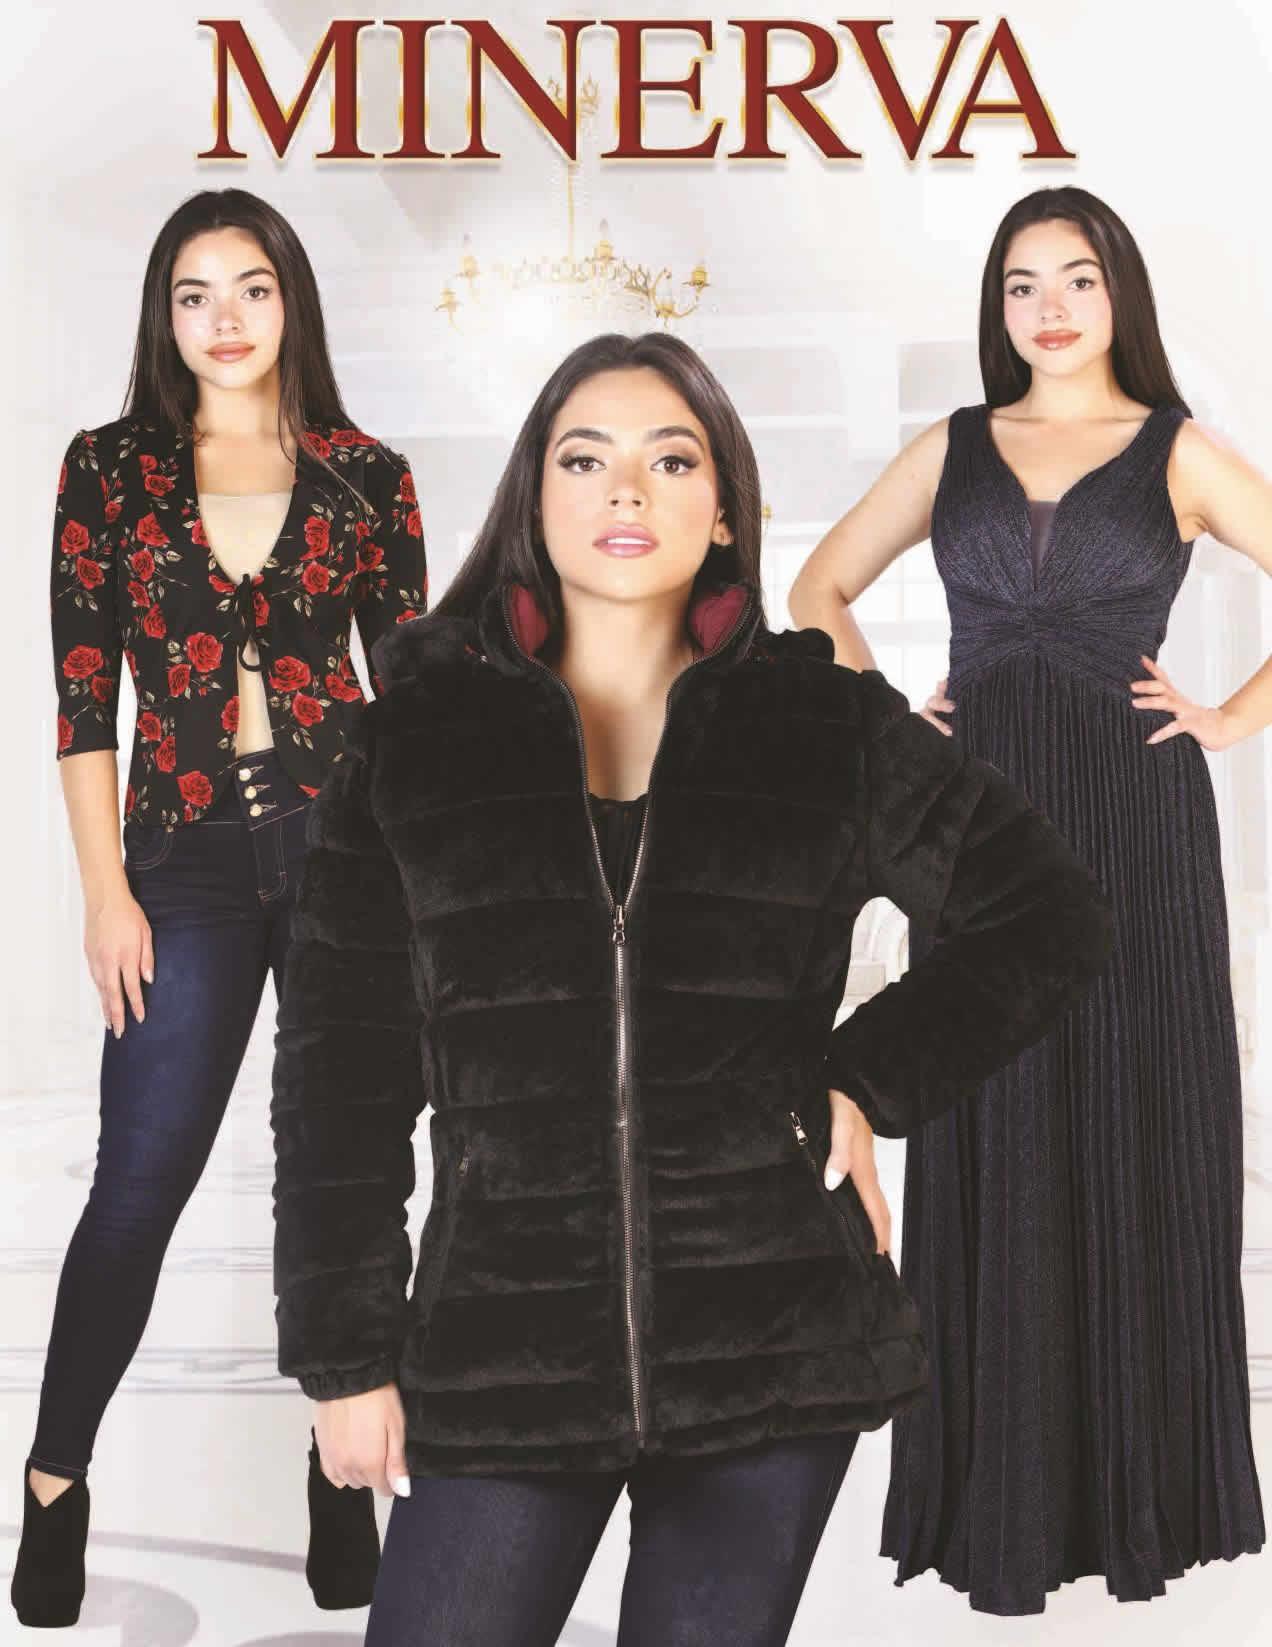 Catalogo Minerva | Venta Por Catalogo | 2020 – 2021